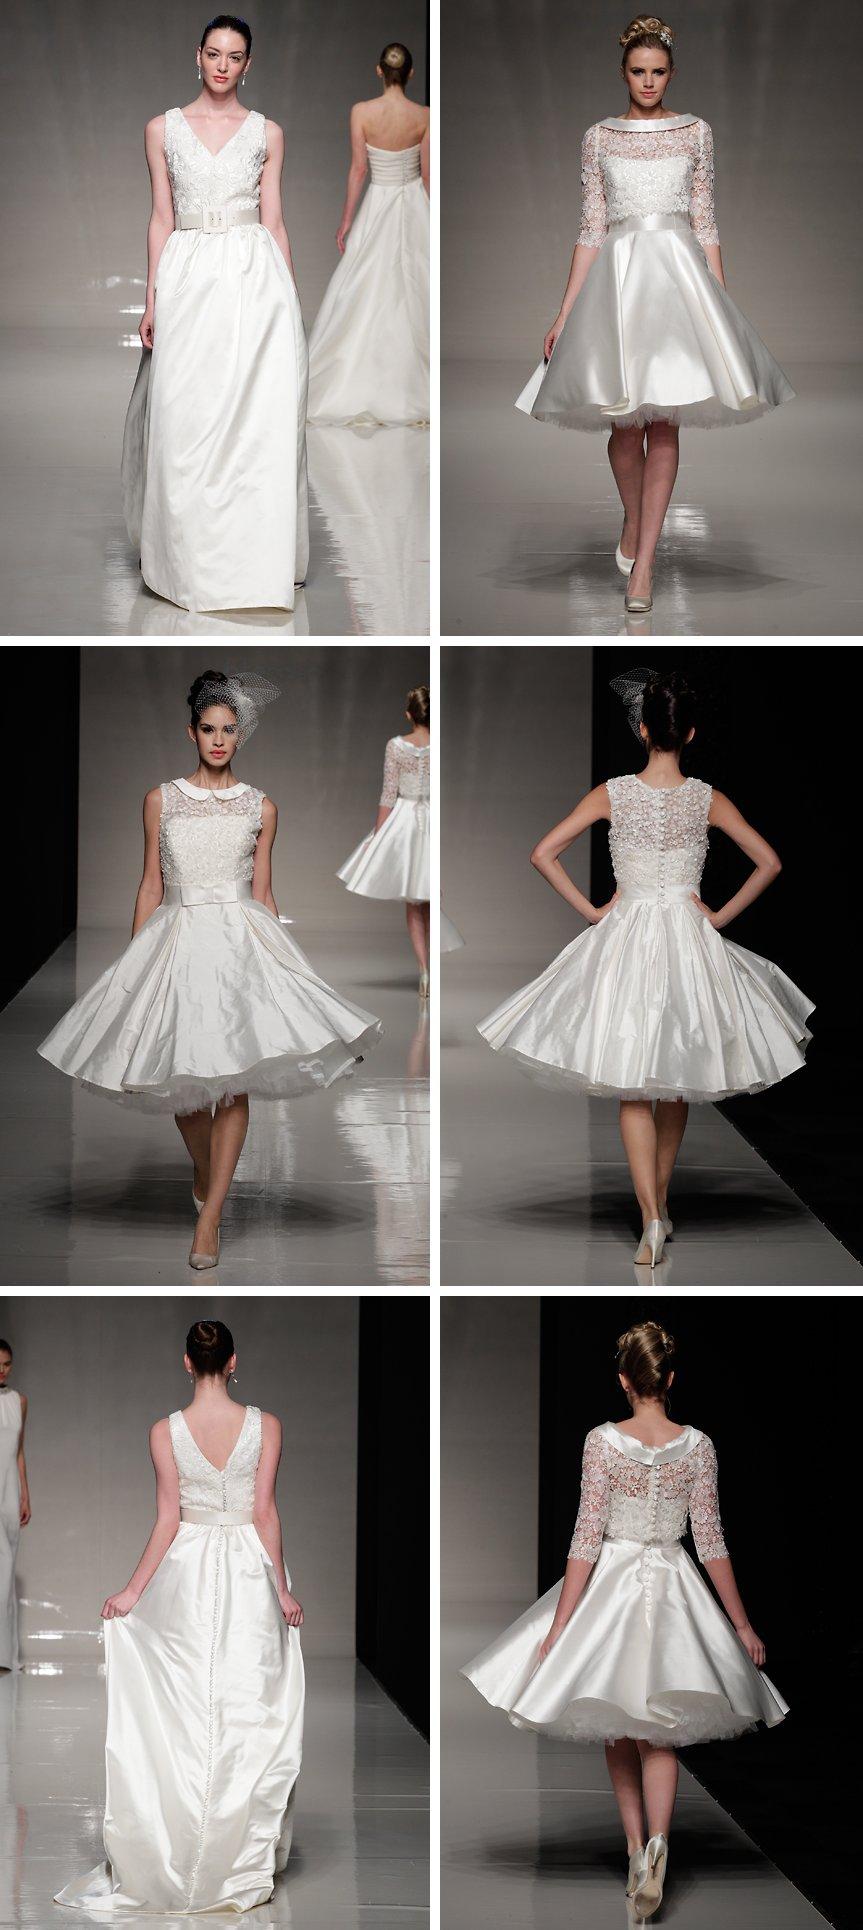 2013-wedding-dress-trends-vintage-inspired-bride-1960s-chic.full